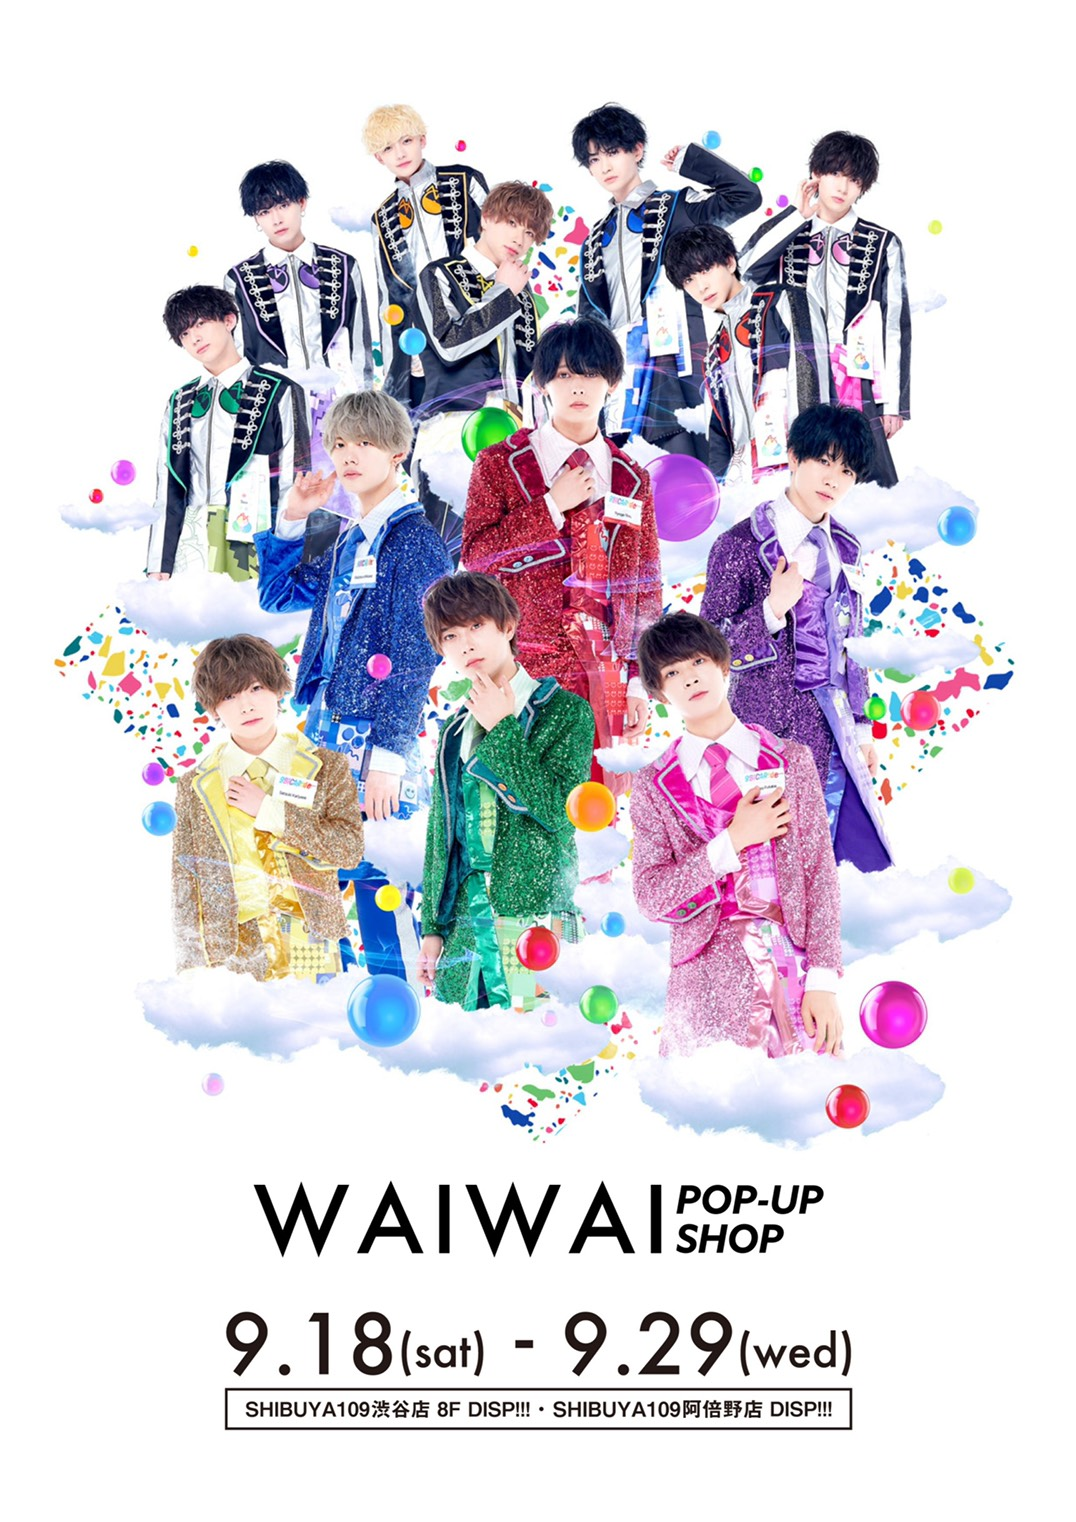 WAIWAI POP-UP SHOP SHIBUYA109 阿倍野店